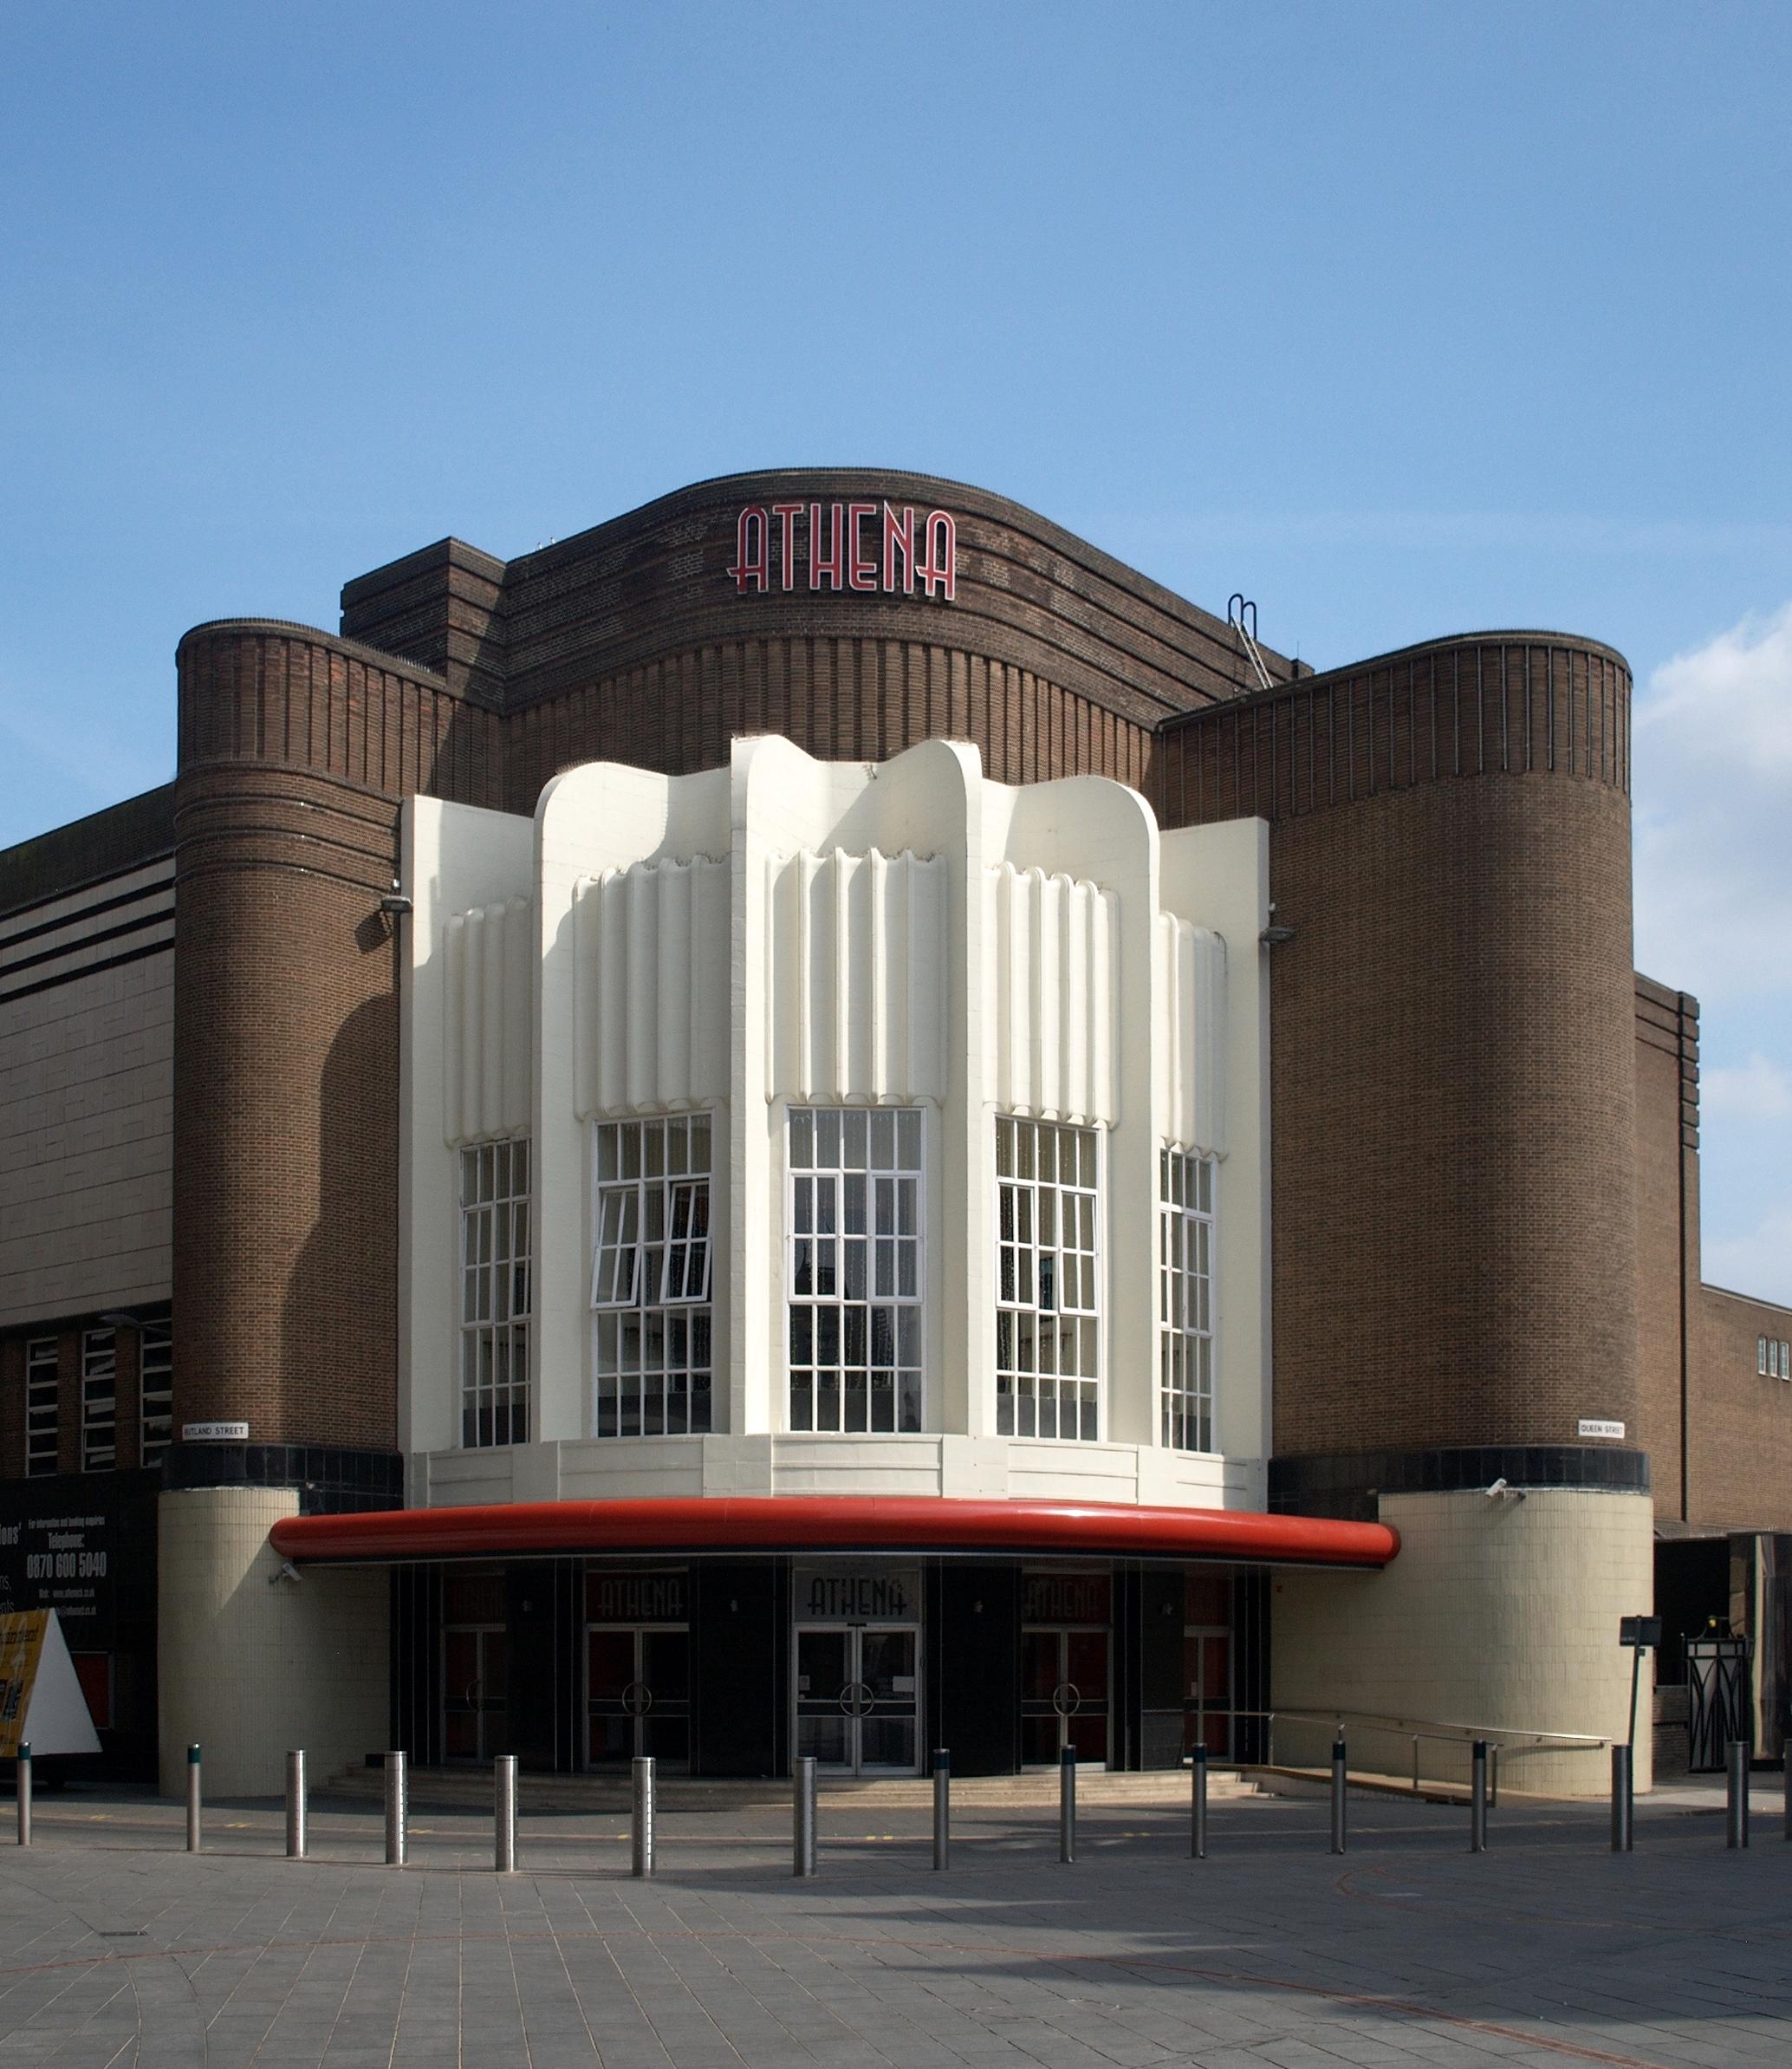 Leicester Athena